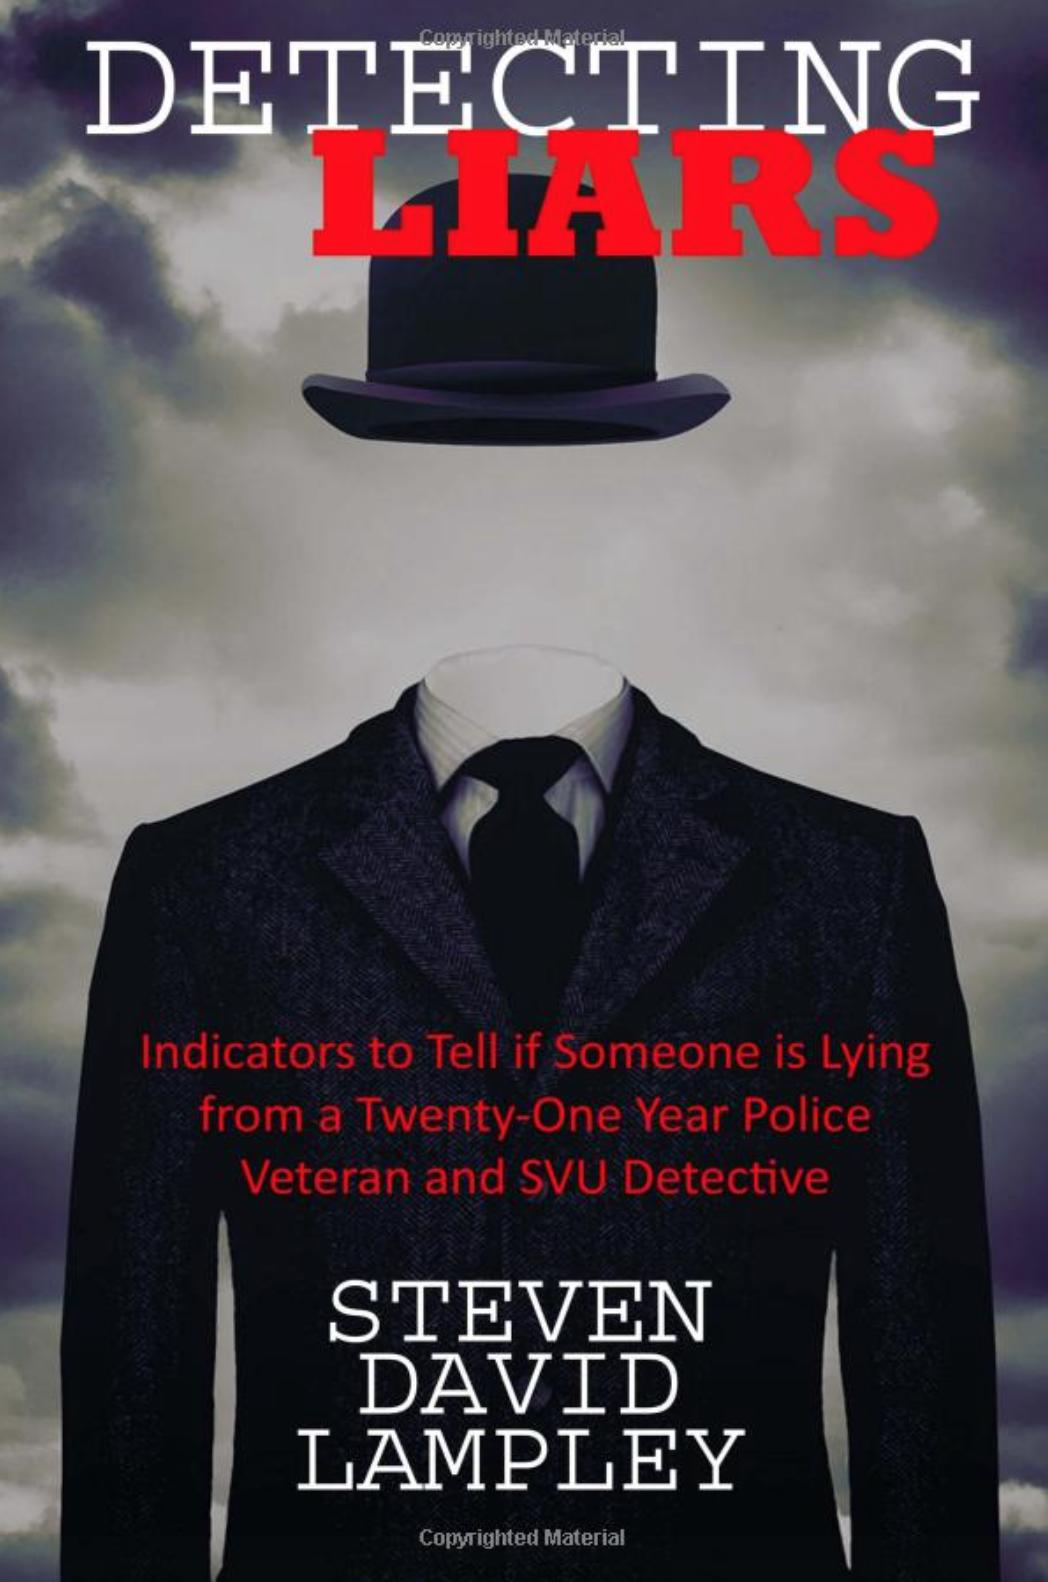 Detecting Liars